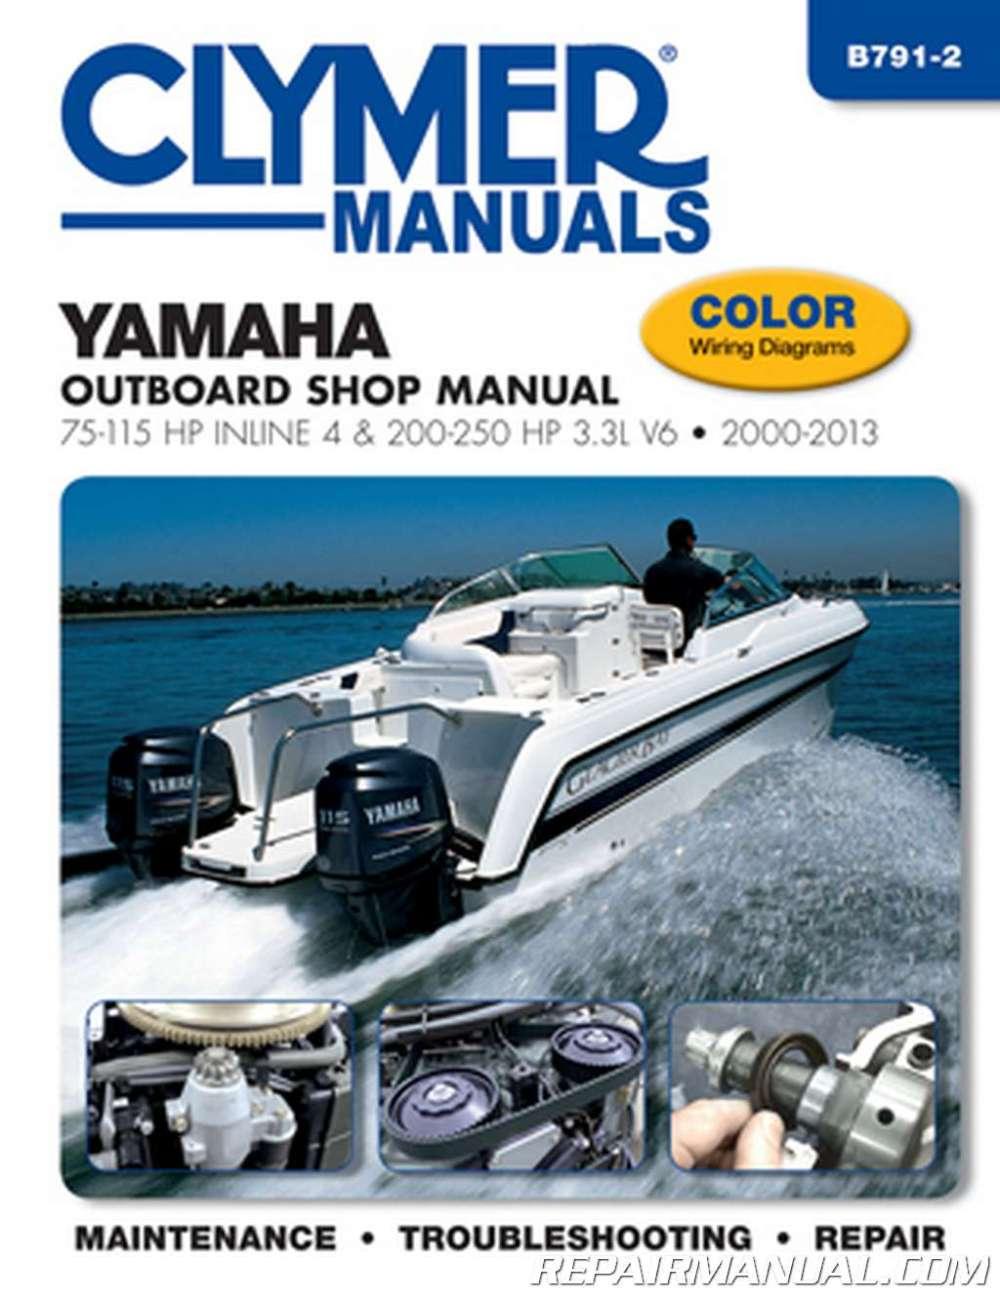 medium resolution of 2000 2013 yamaha outboard shop manual